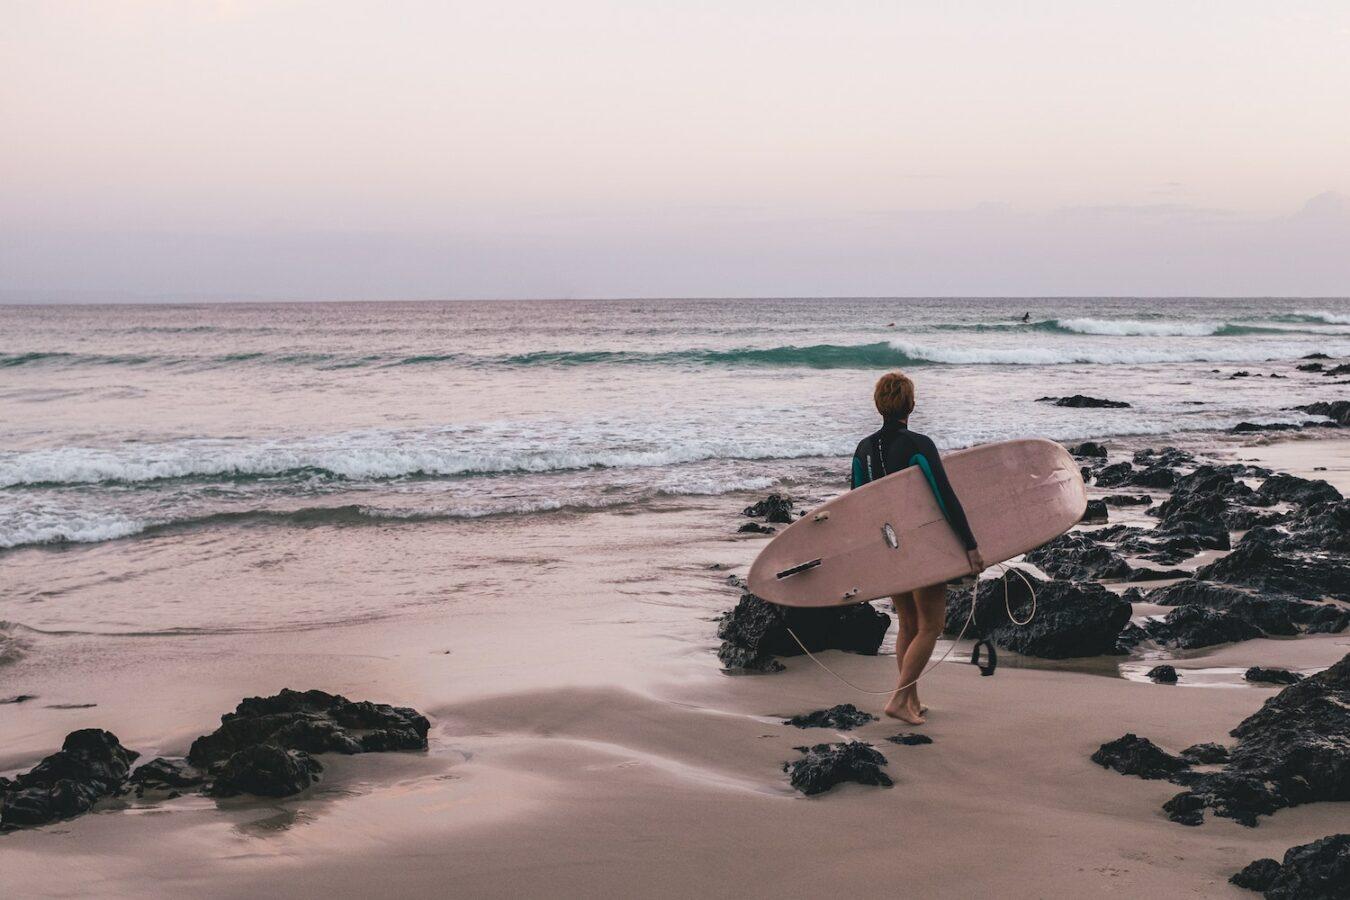 Partir surfer en Australie